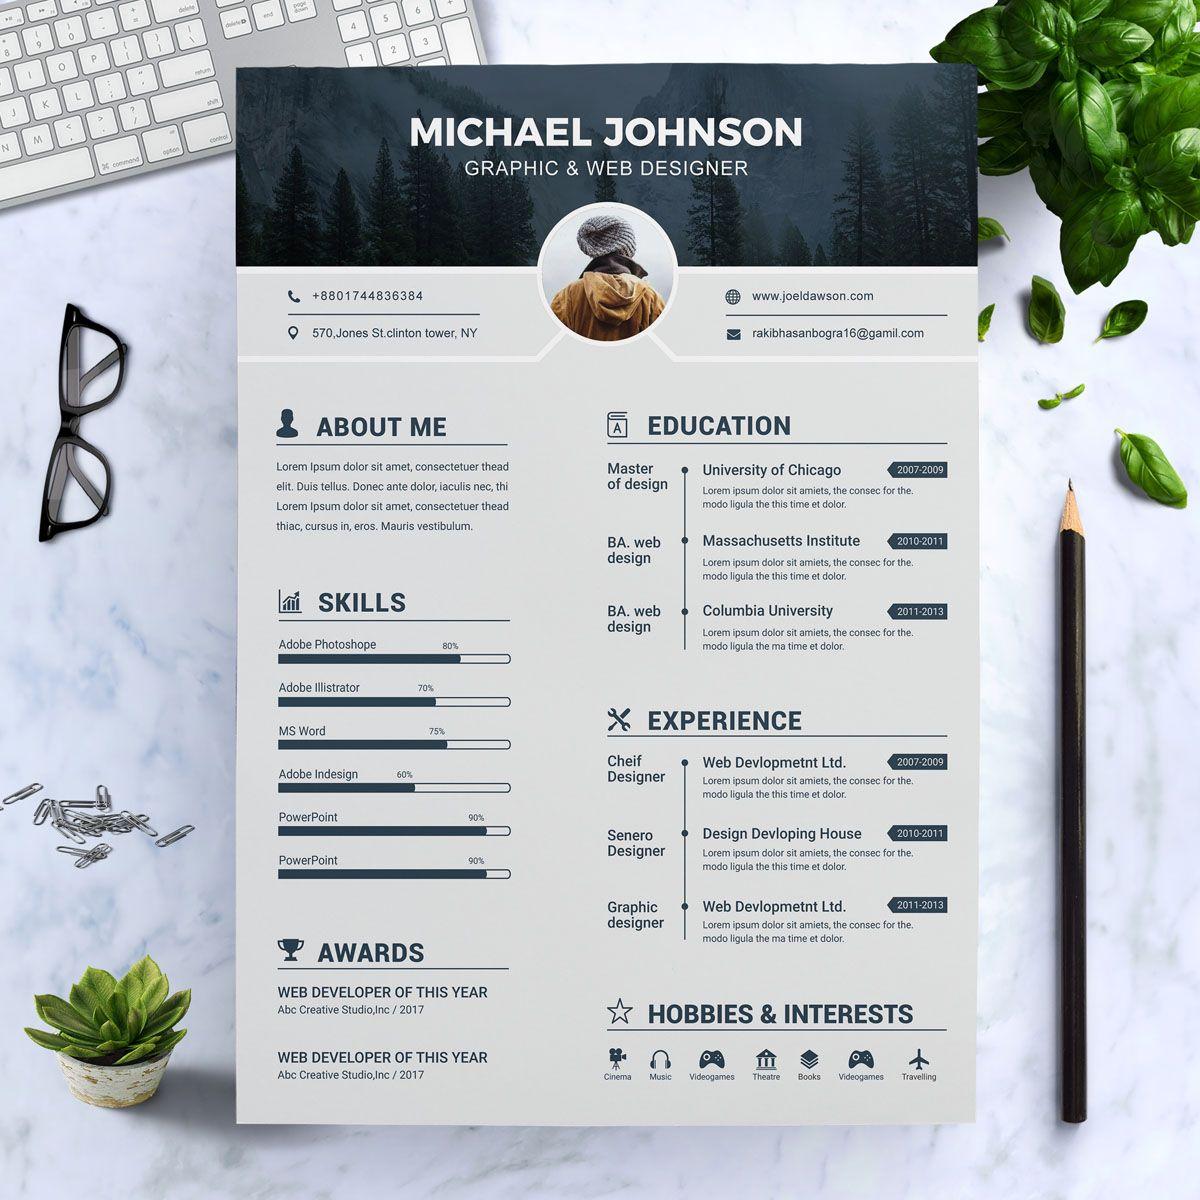 johnson graphic designer resume template